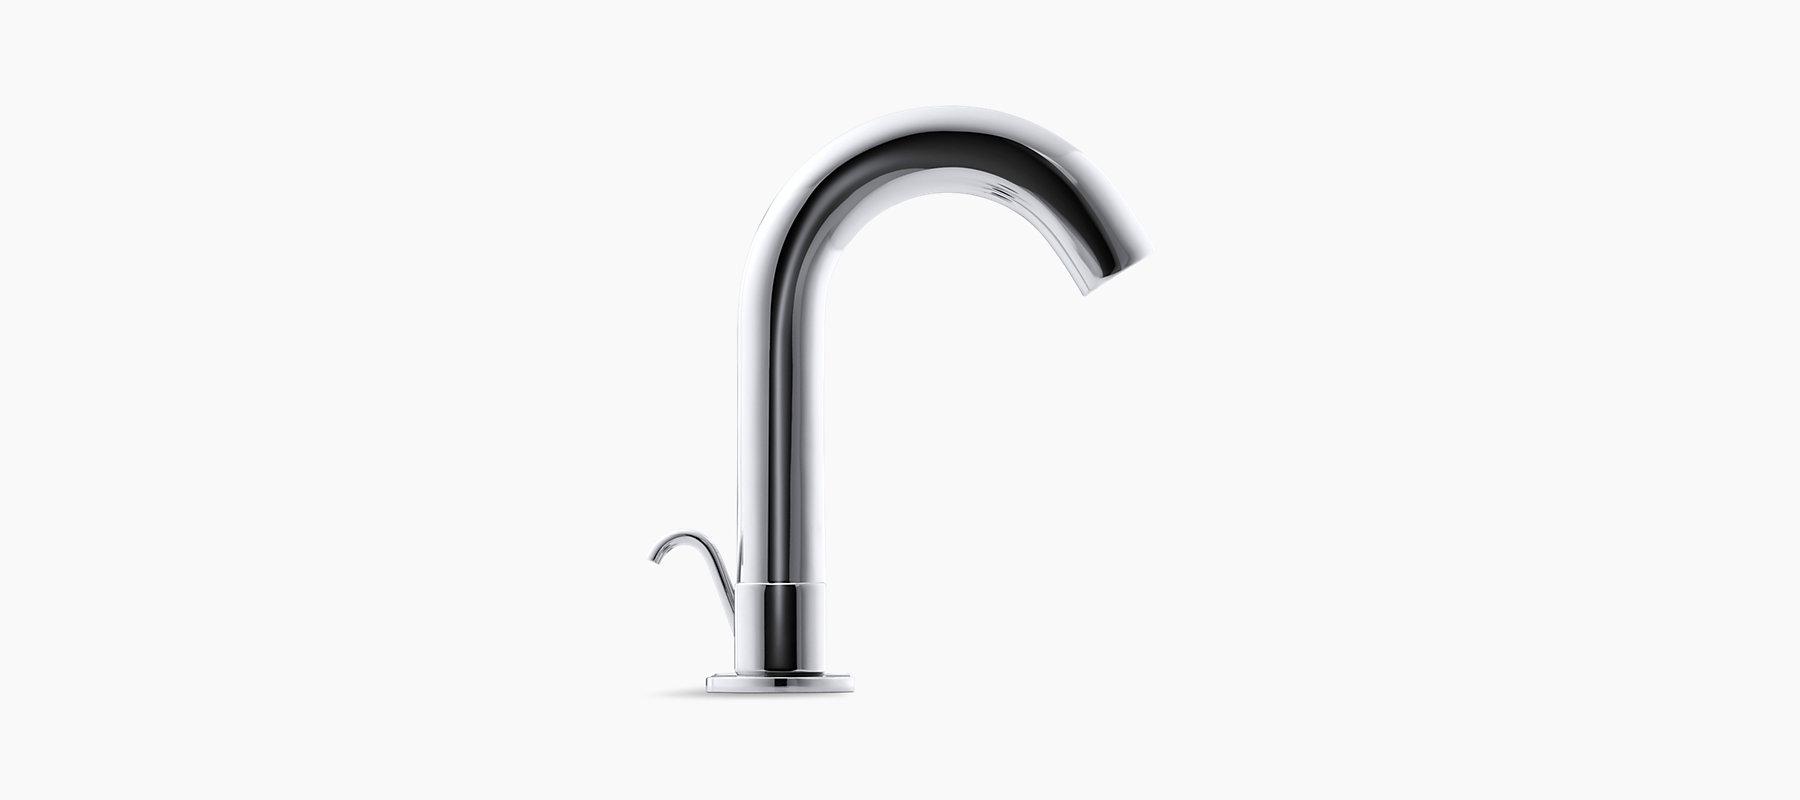 Oblo Widespread Bathroom Sink Faucet | K-10086-9 | KOHLER